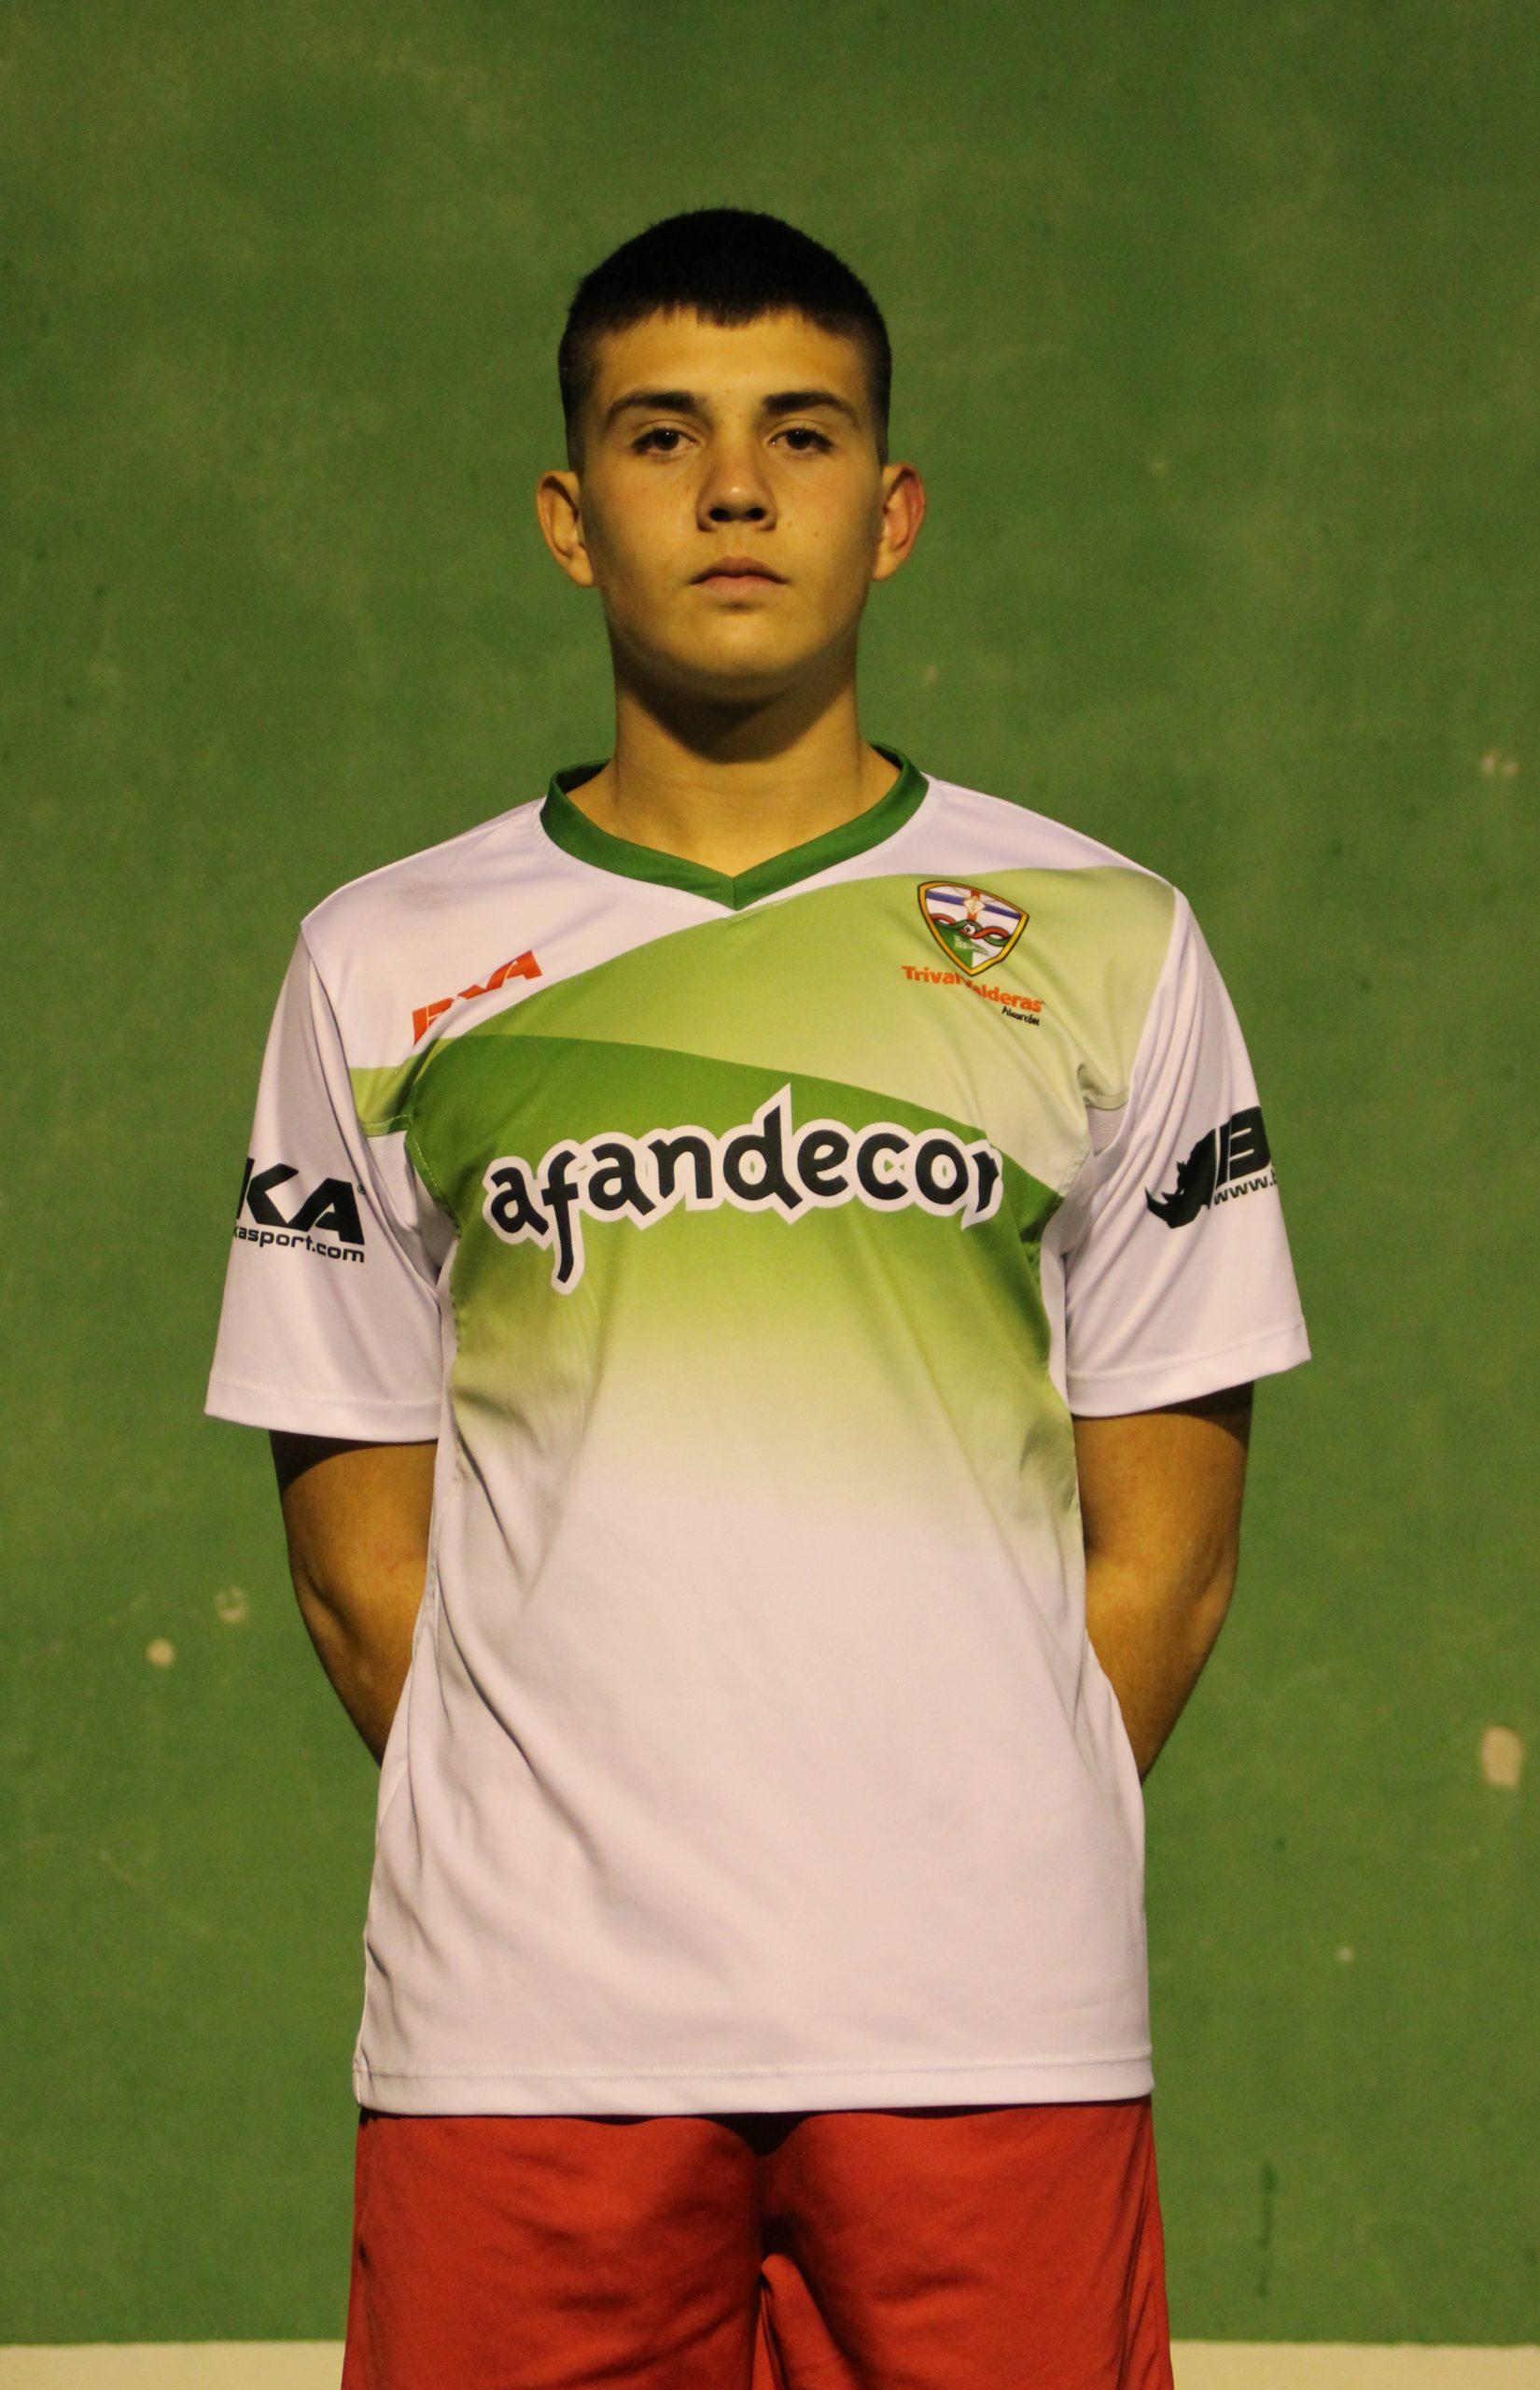 1 Daniel Montoya Rodríguez